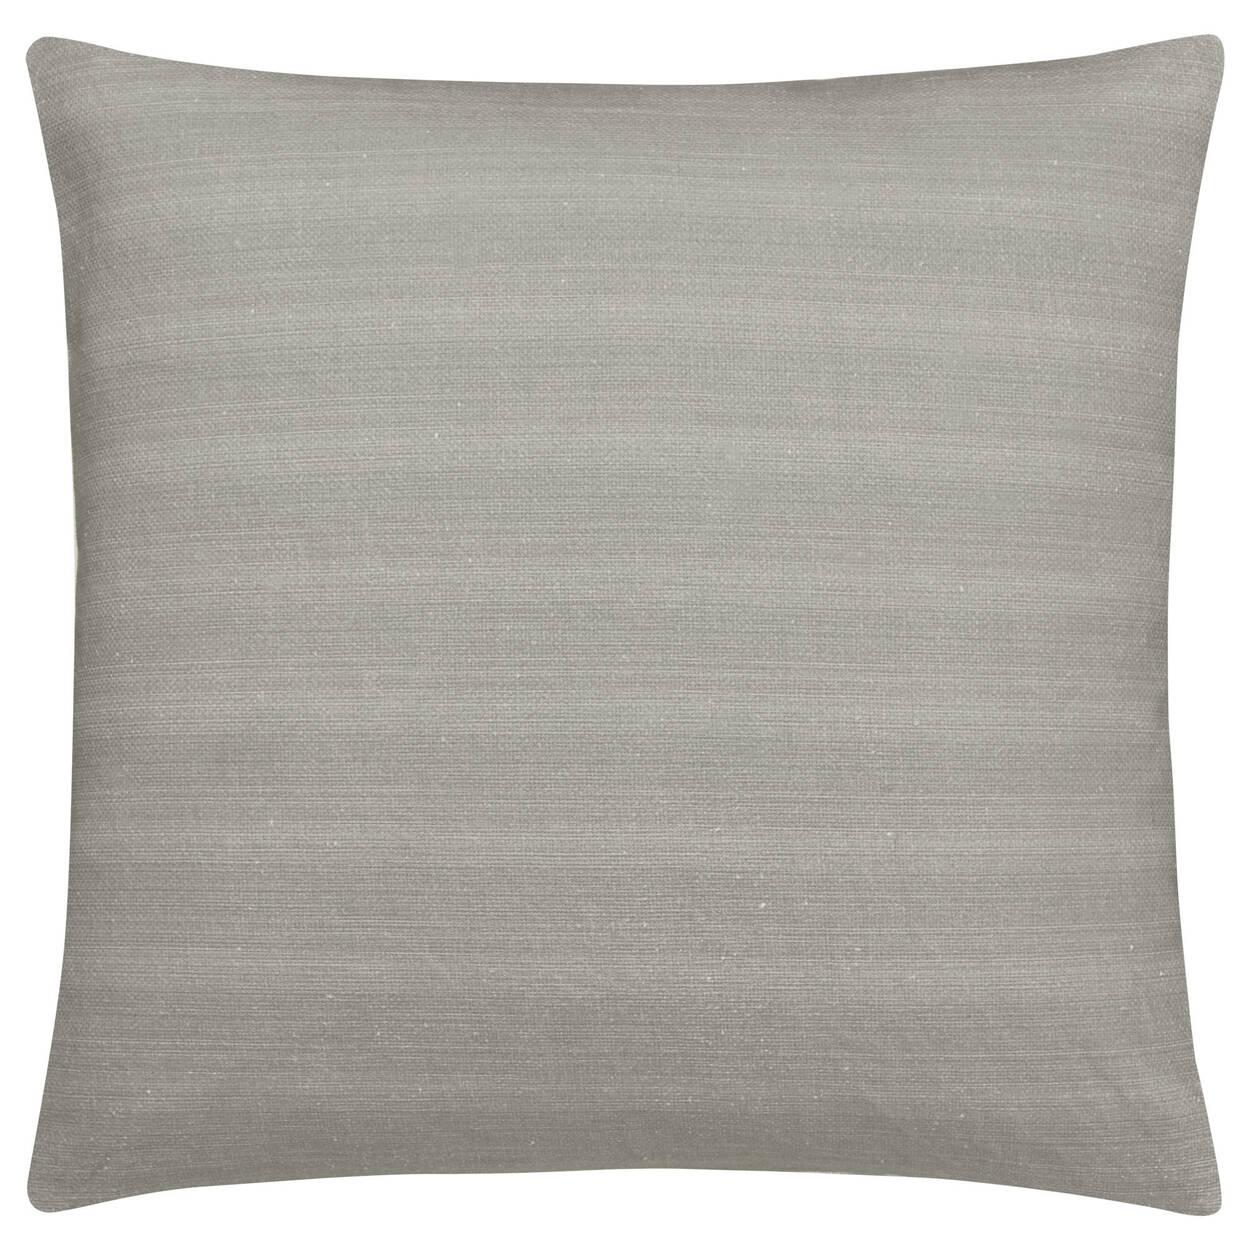 "Agave Decorative Pillow 19"" X 19"""